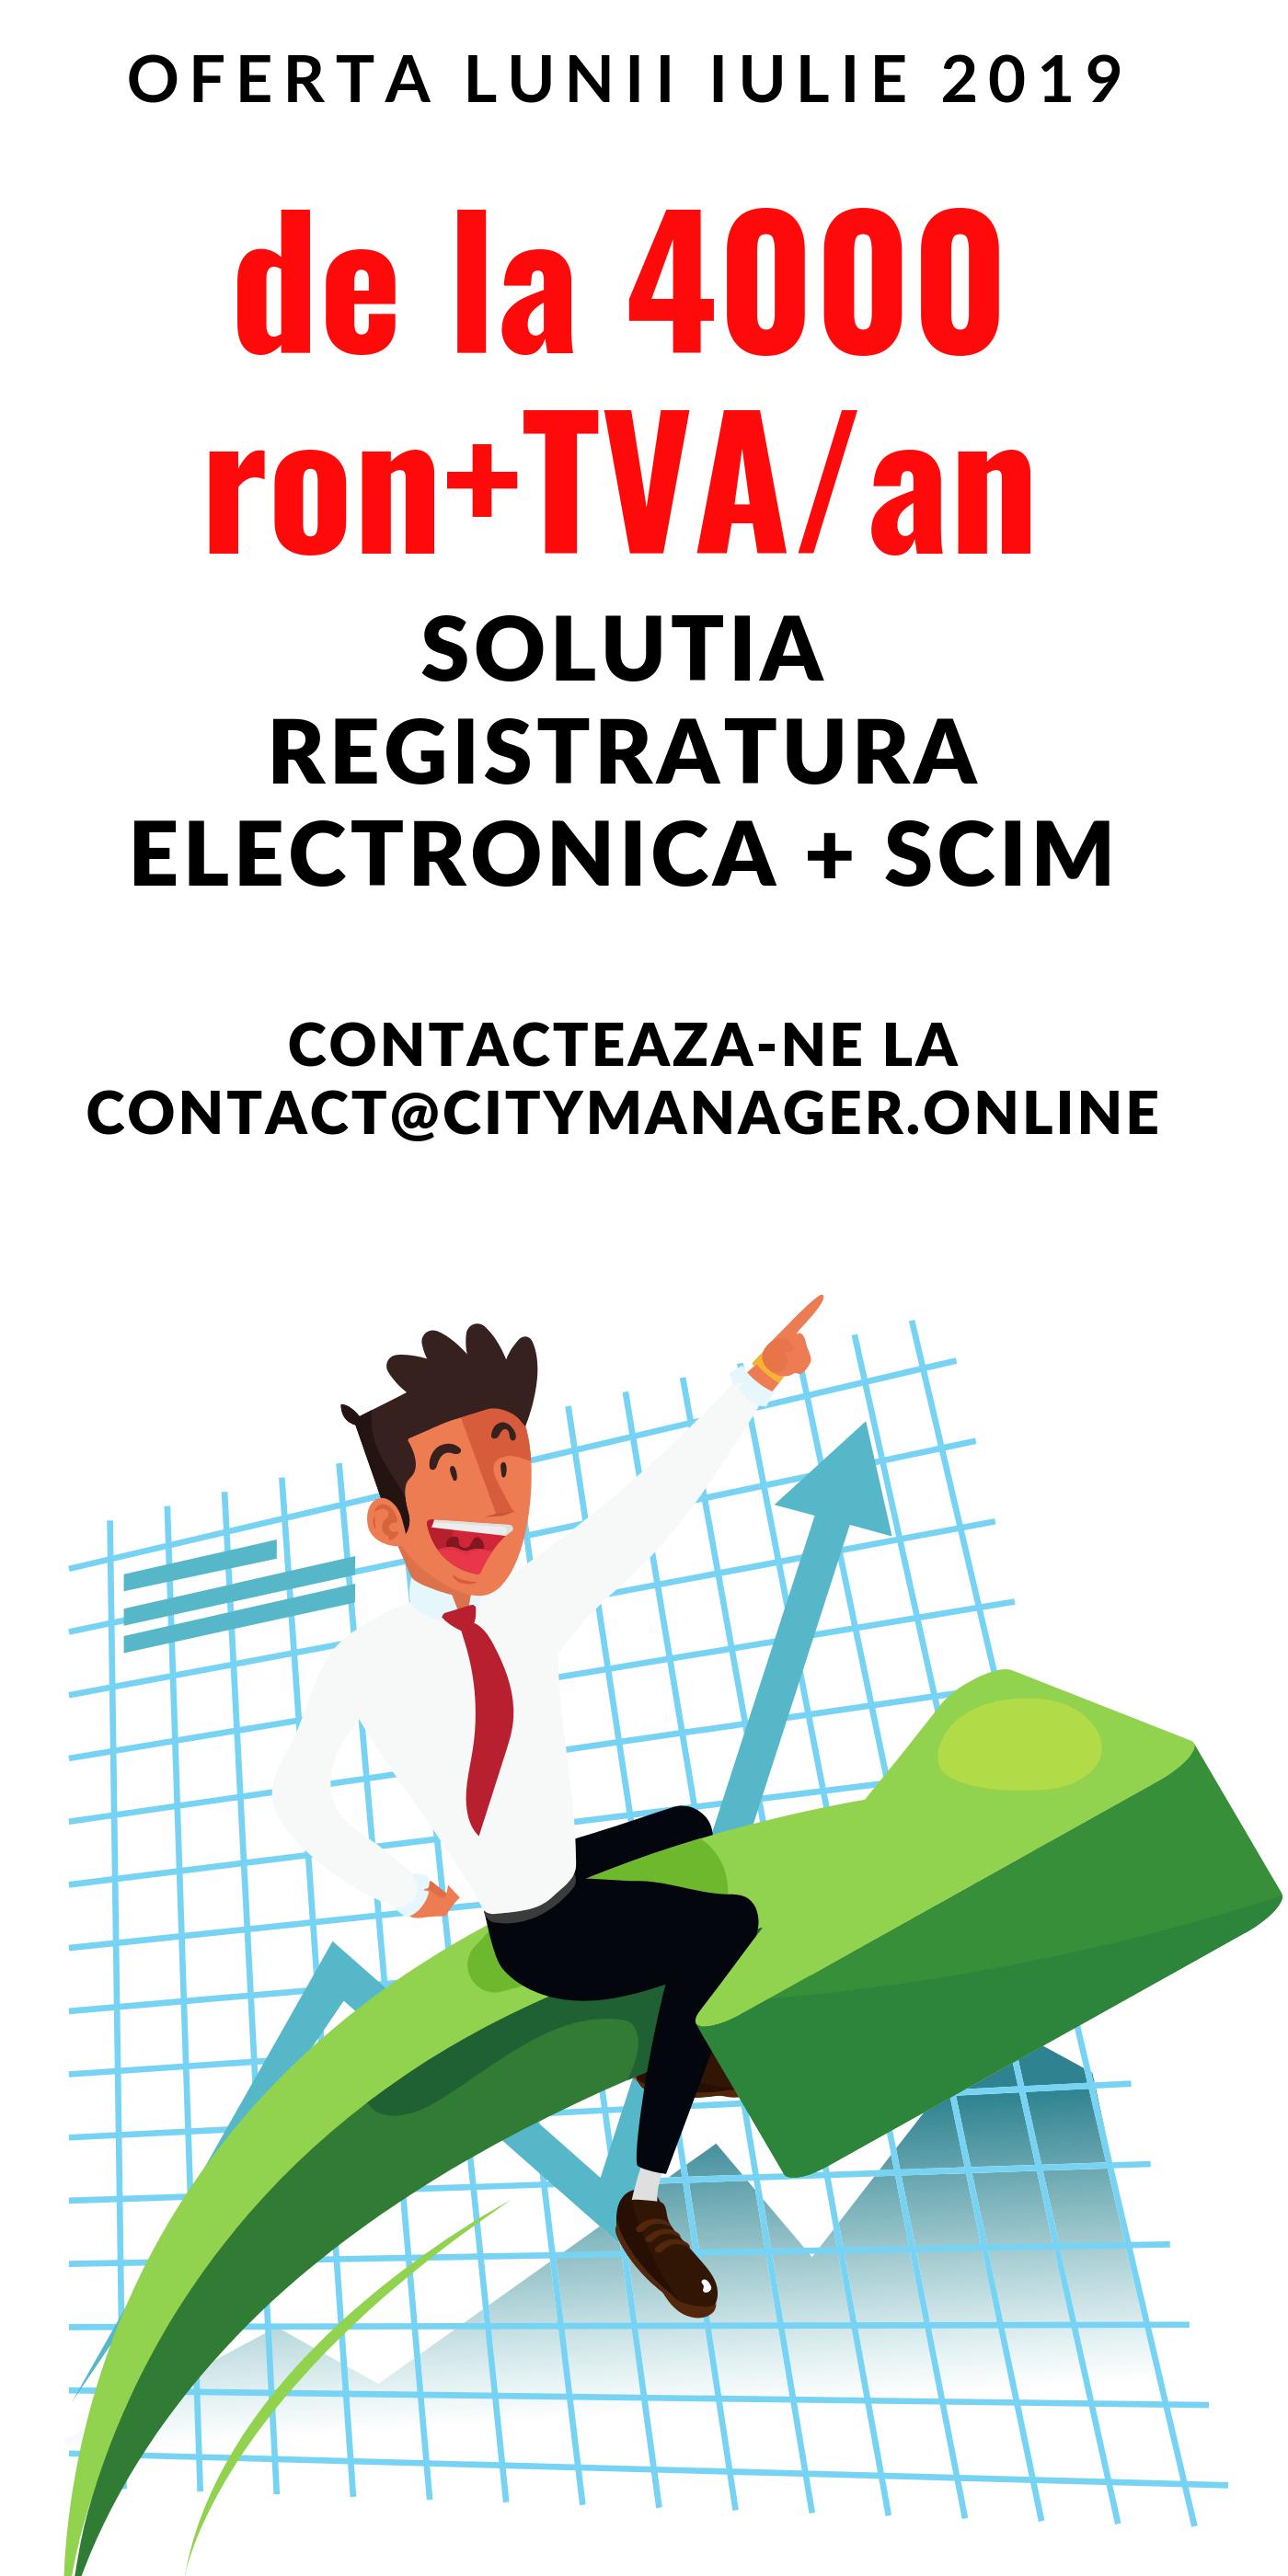 registratura electronica